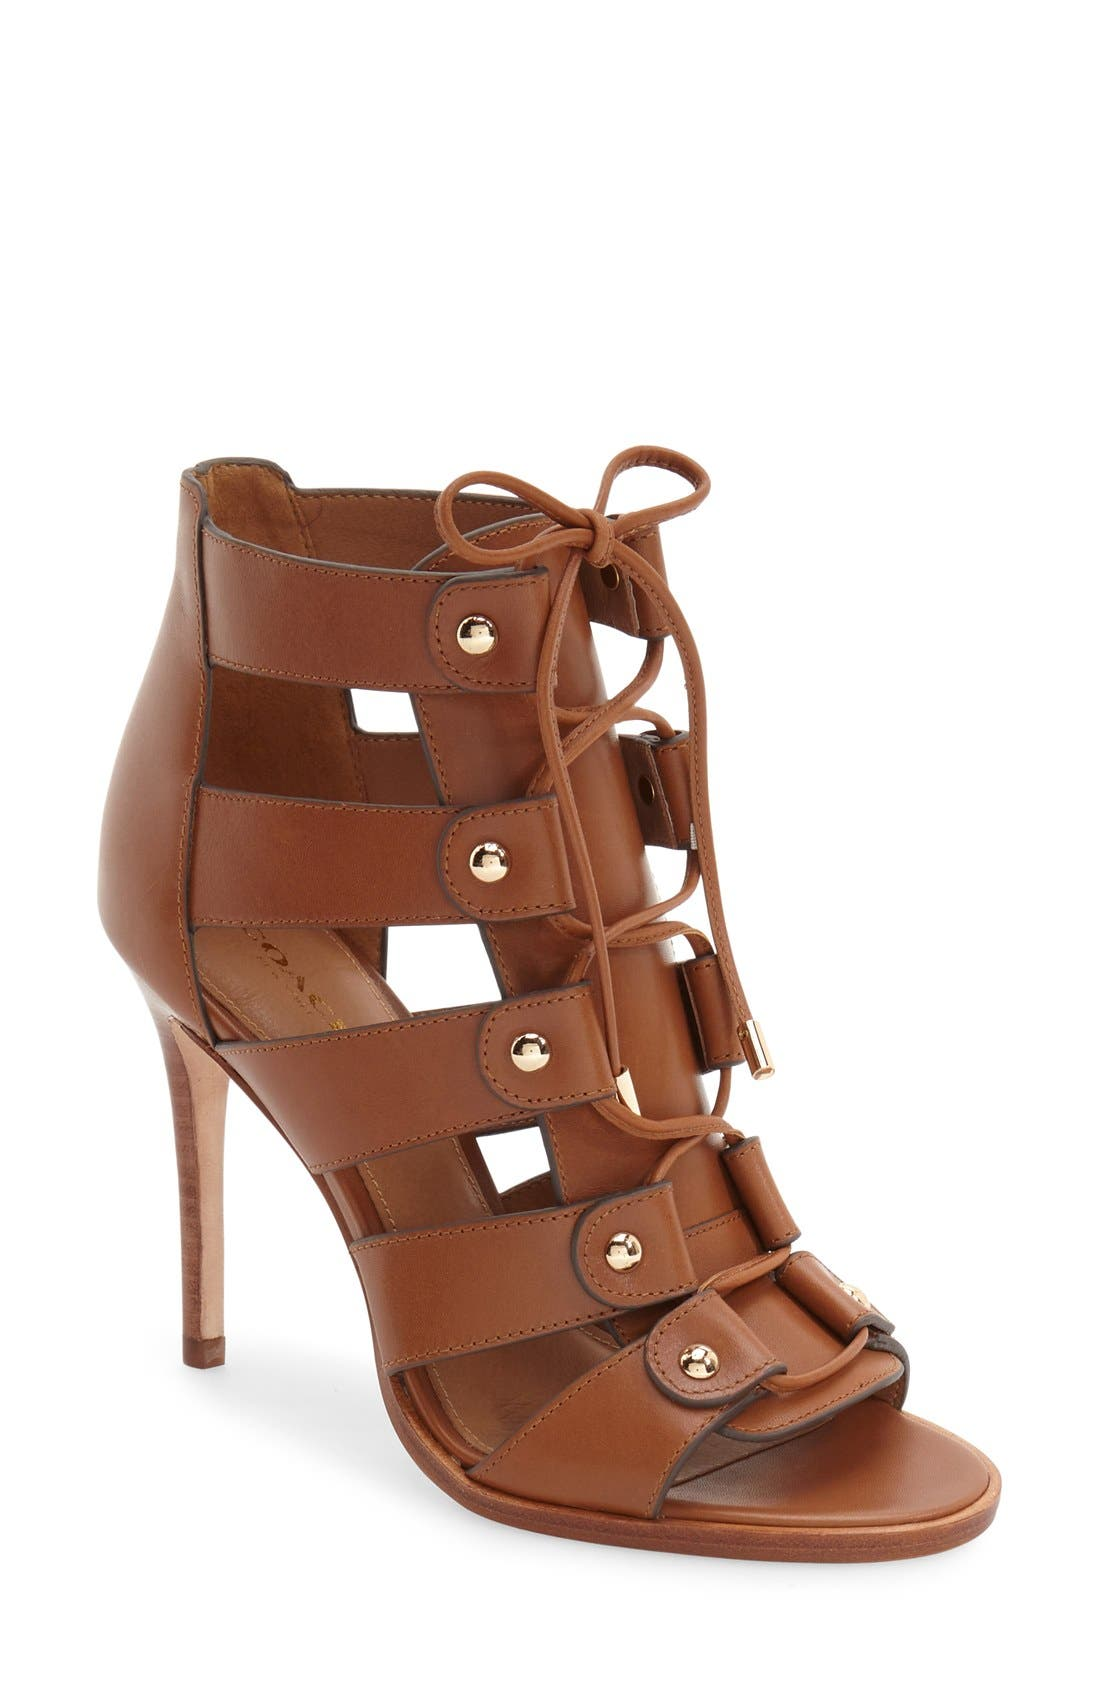 Alternate Image 1 Selected - COACH 'Leslie' Lace-Up Sandal (Women)